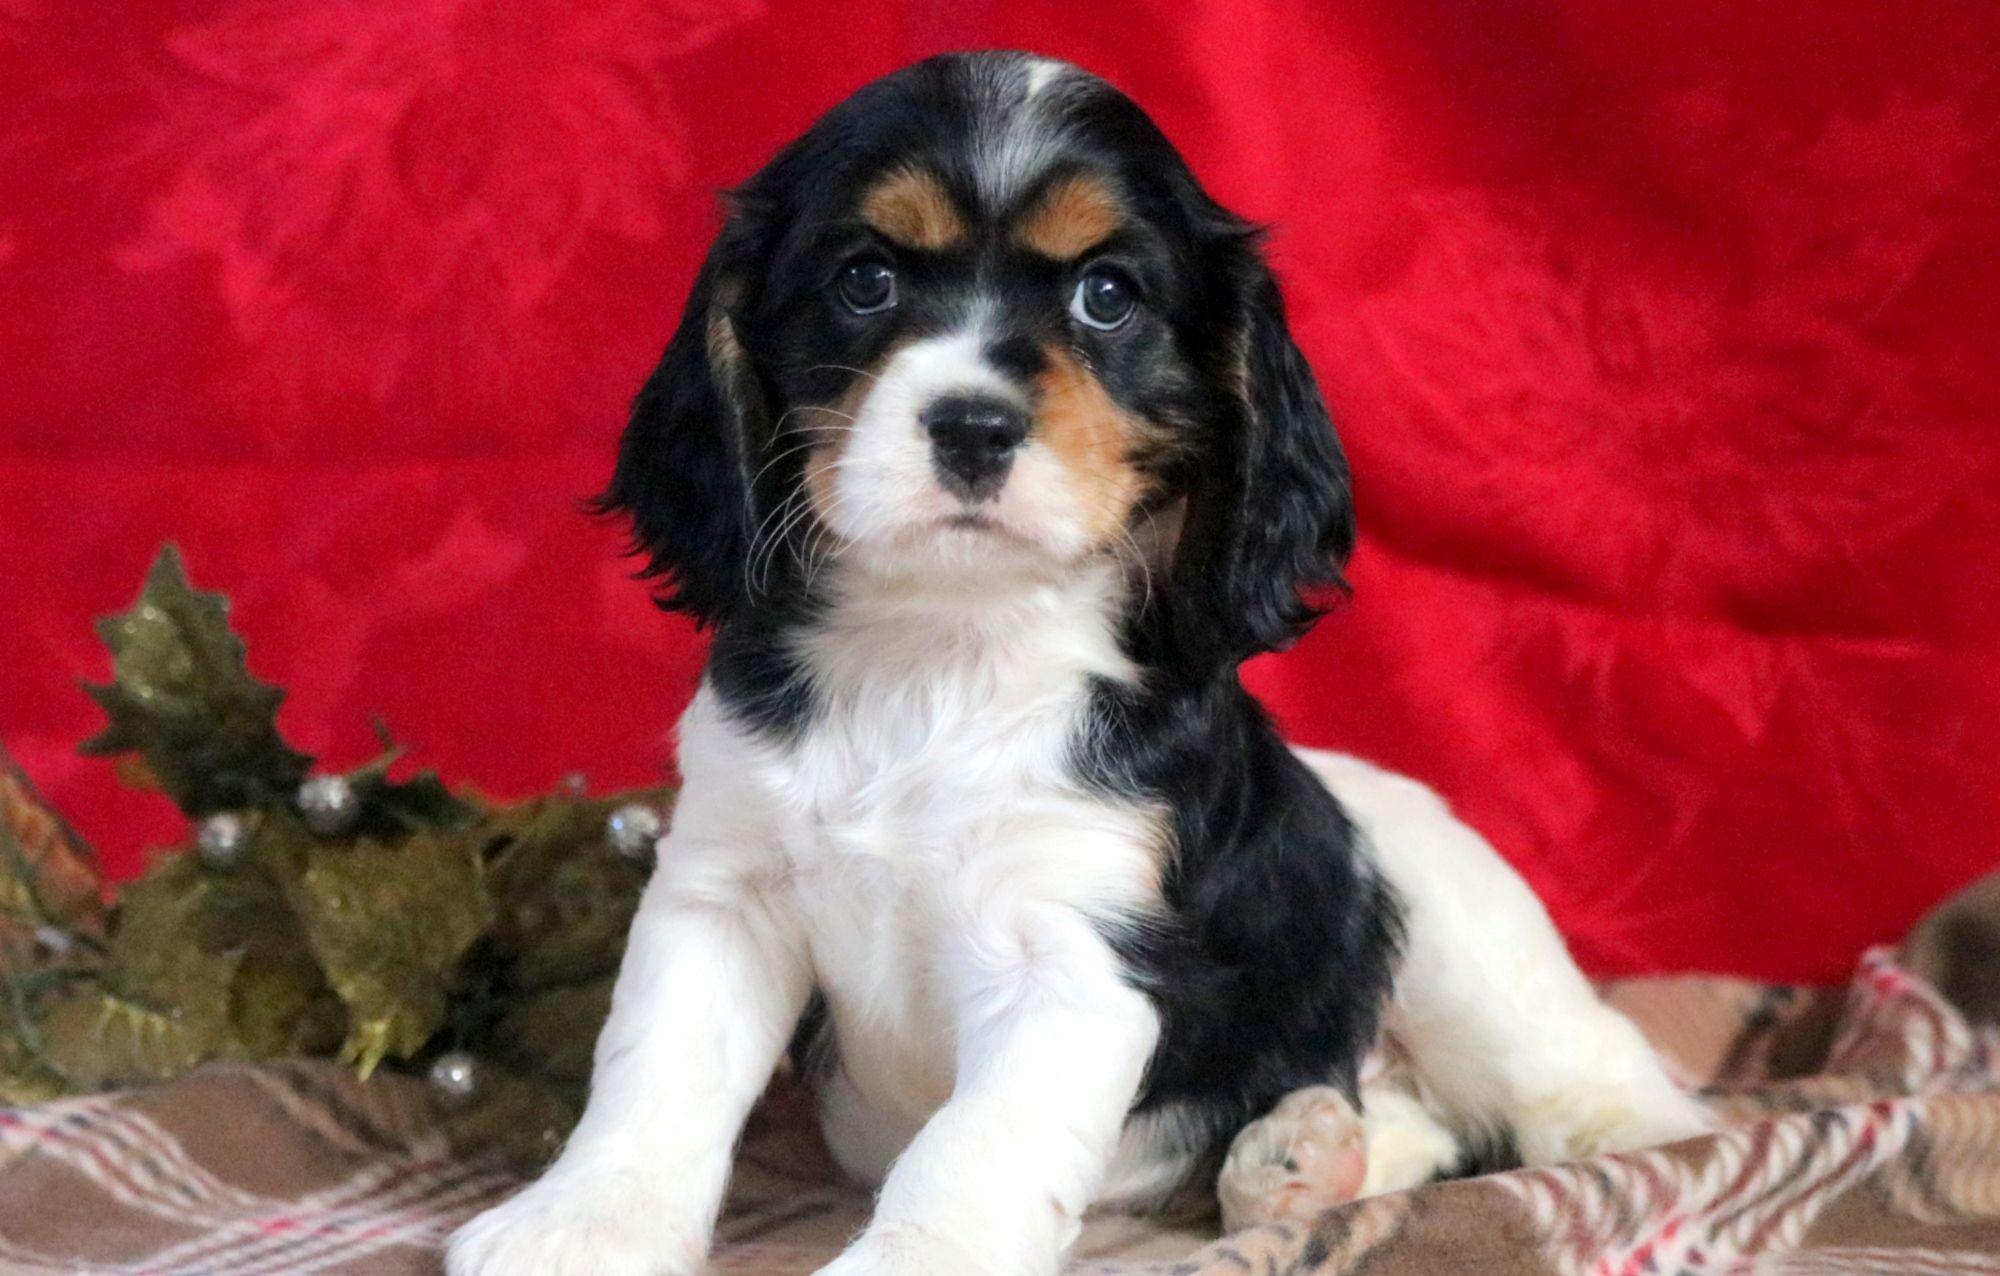 Cockalier Puppies For Sale Puppy Adoption Keystone Puppies Spaniel Puppies Spaniel Puppies For Sale Puppies For Sale